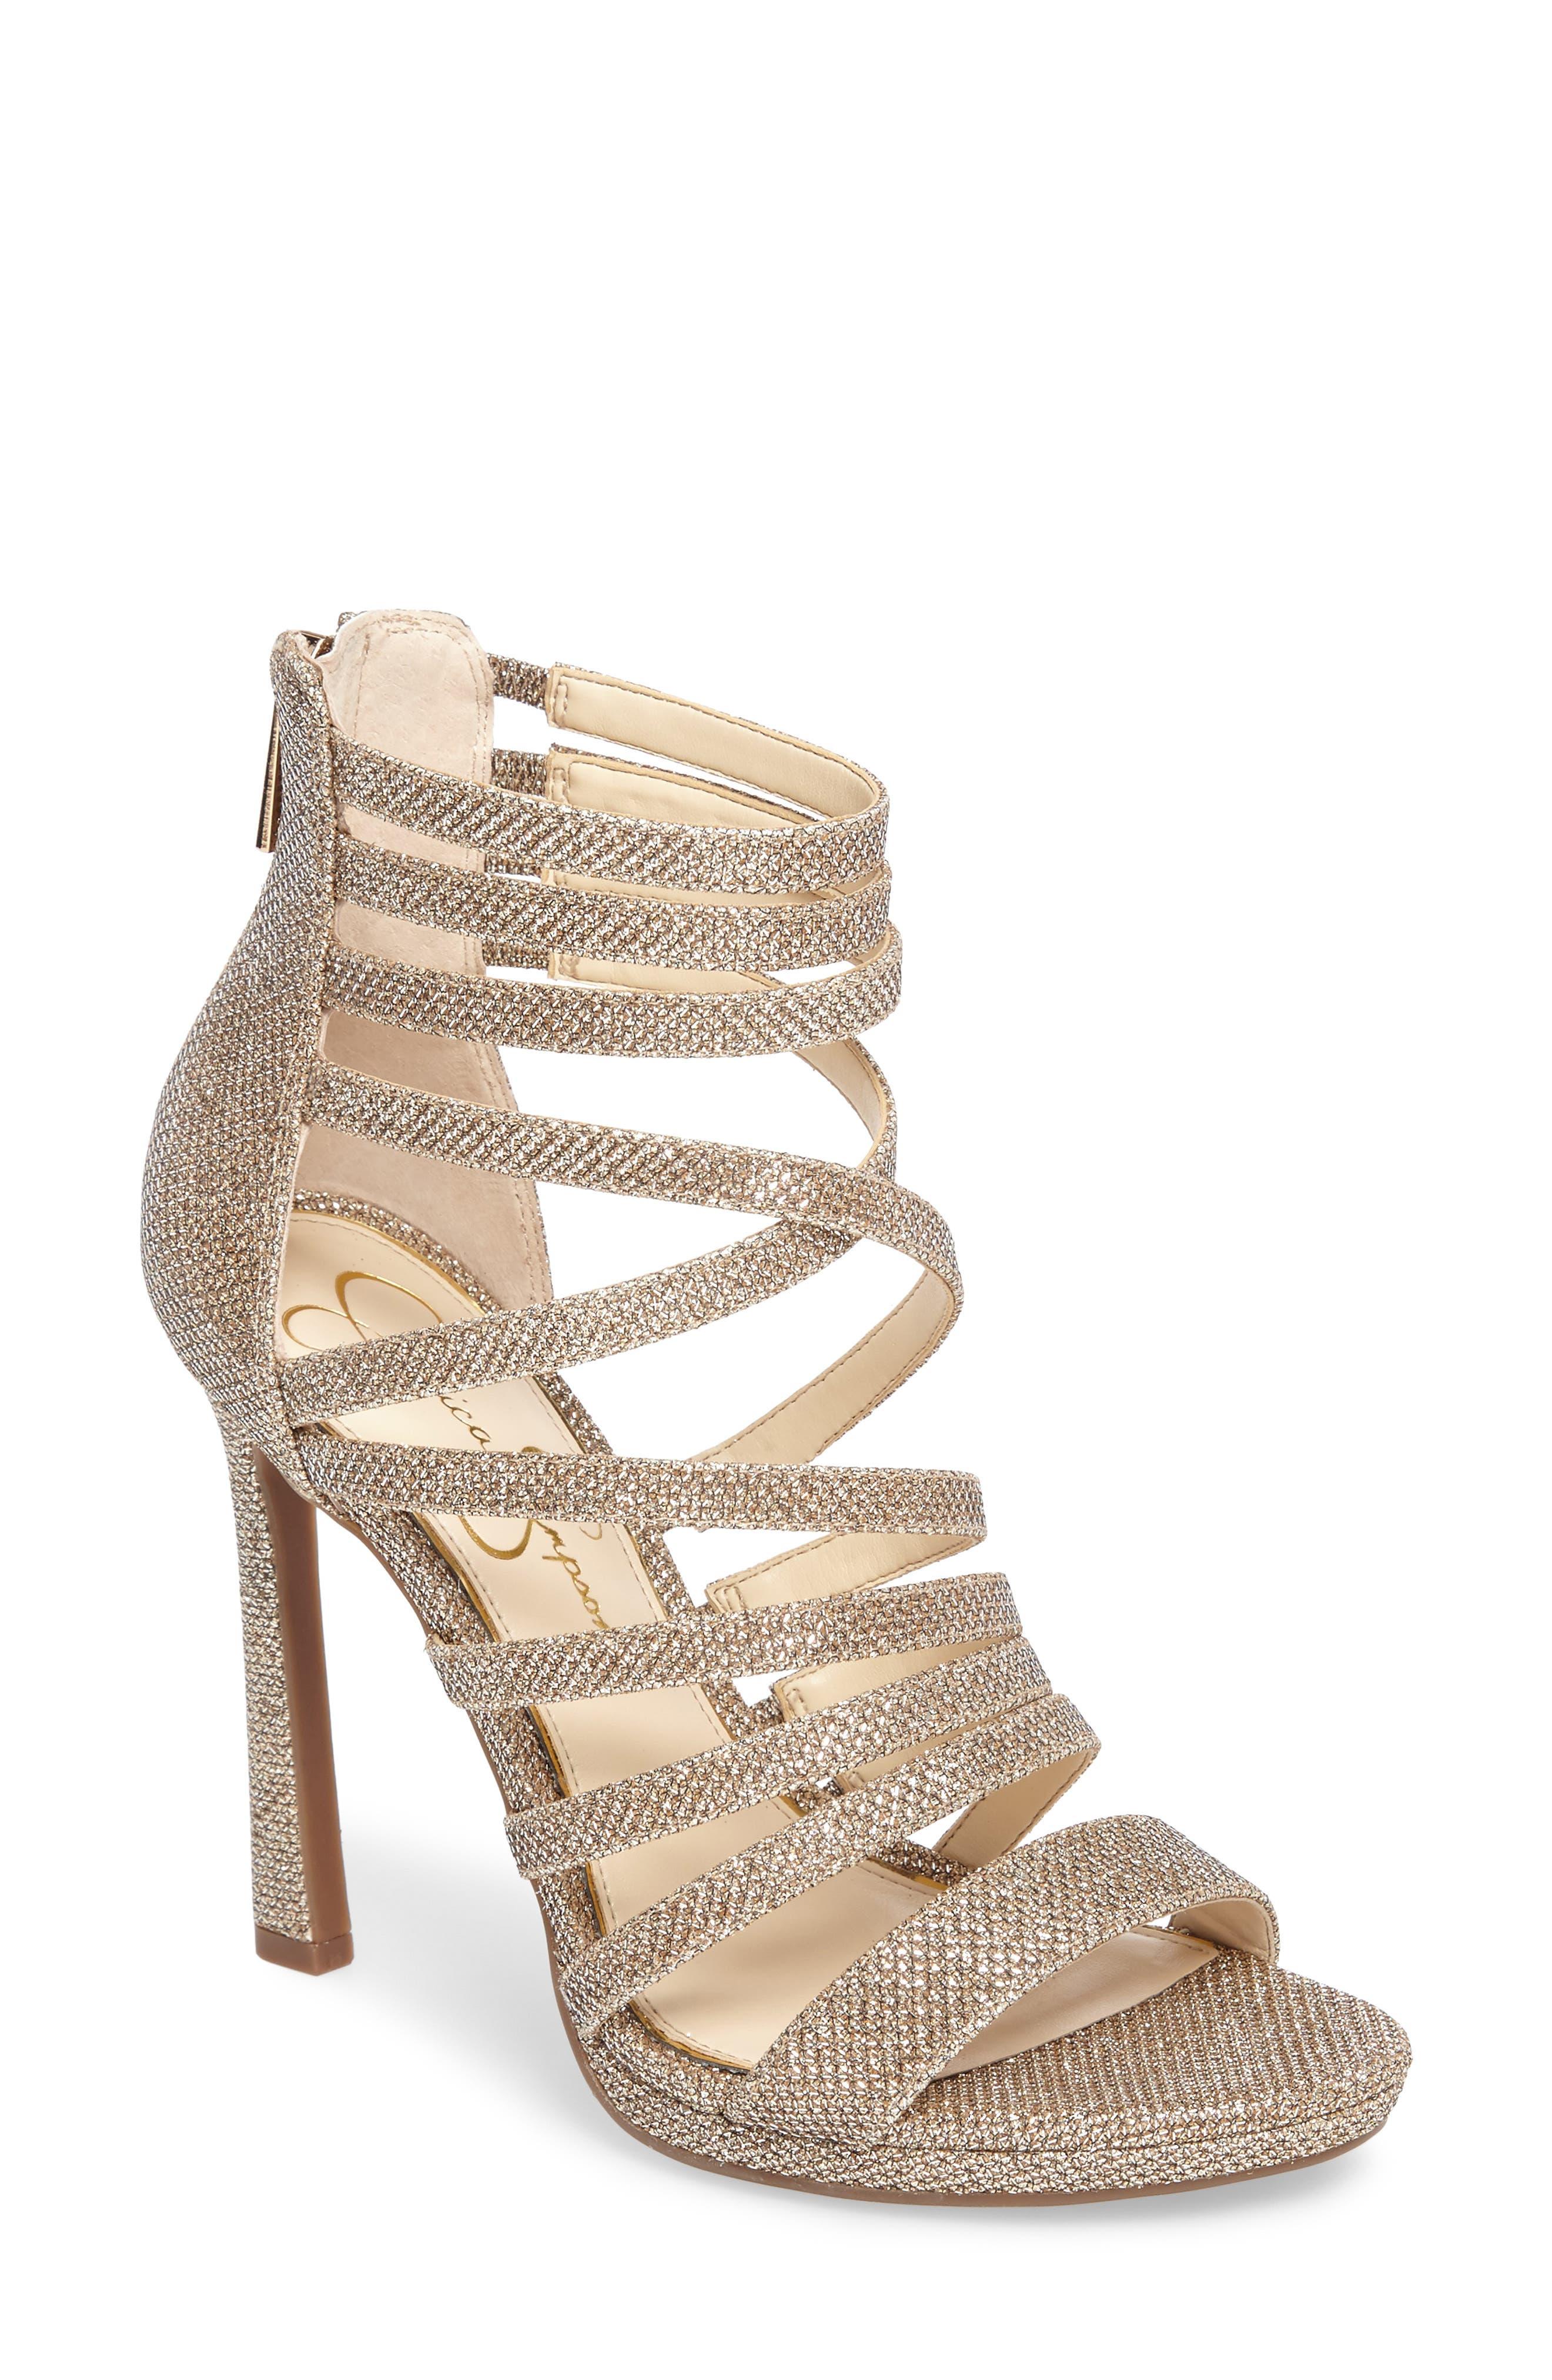 Jessica Simpson Palkaya Strappy Sandal (Women's) CJBJb